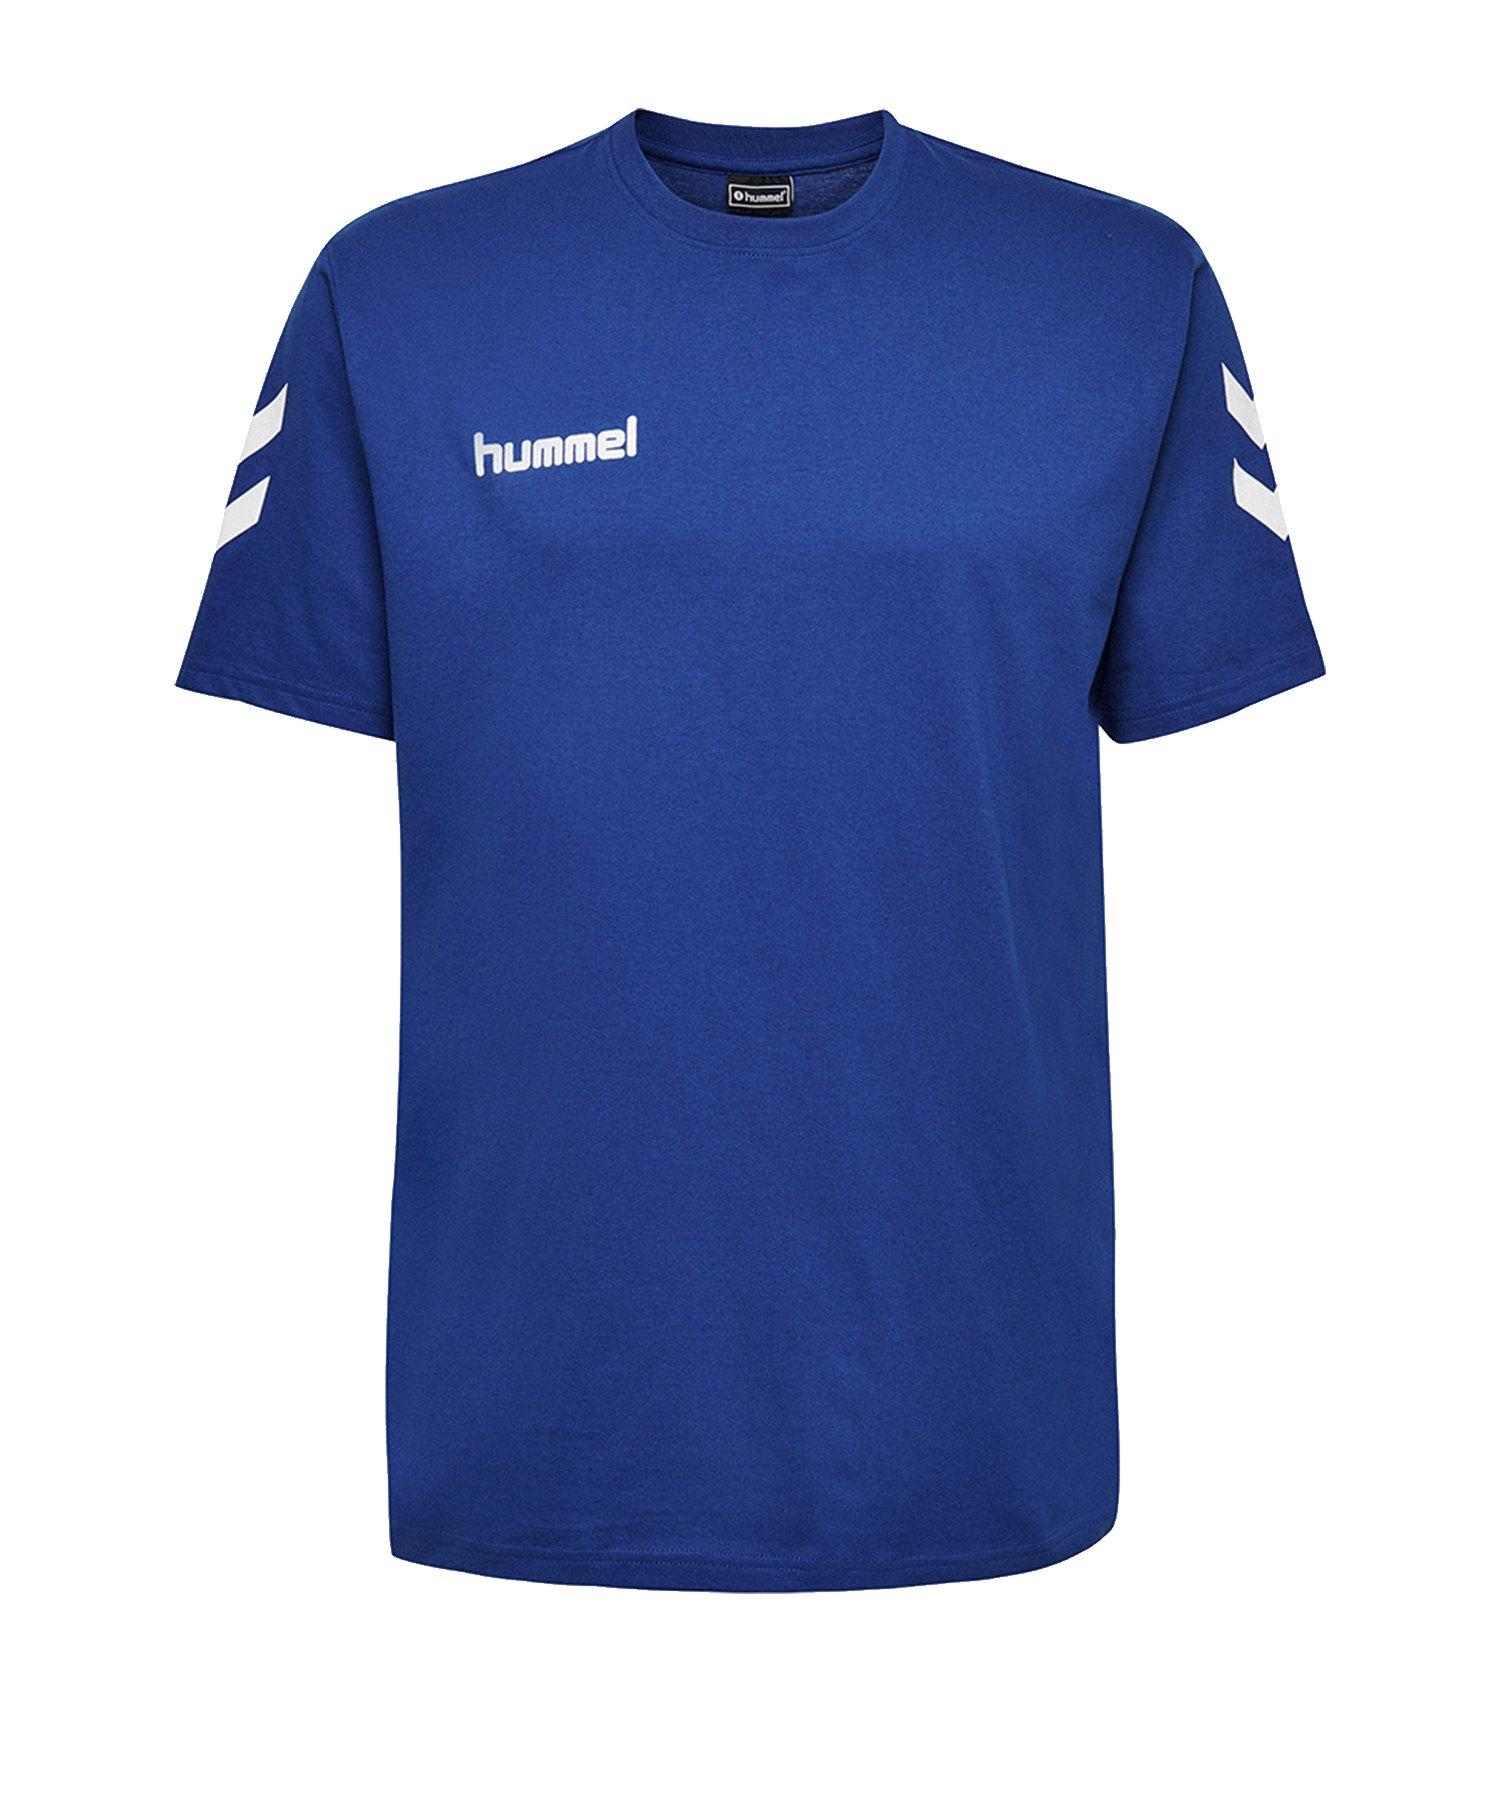 Hummel Cotton T-Shirt Blau F7045 - Blau